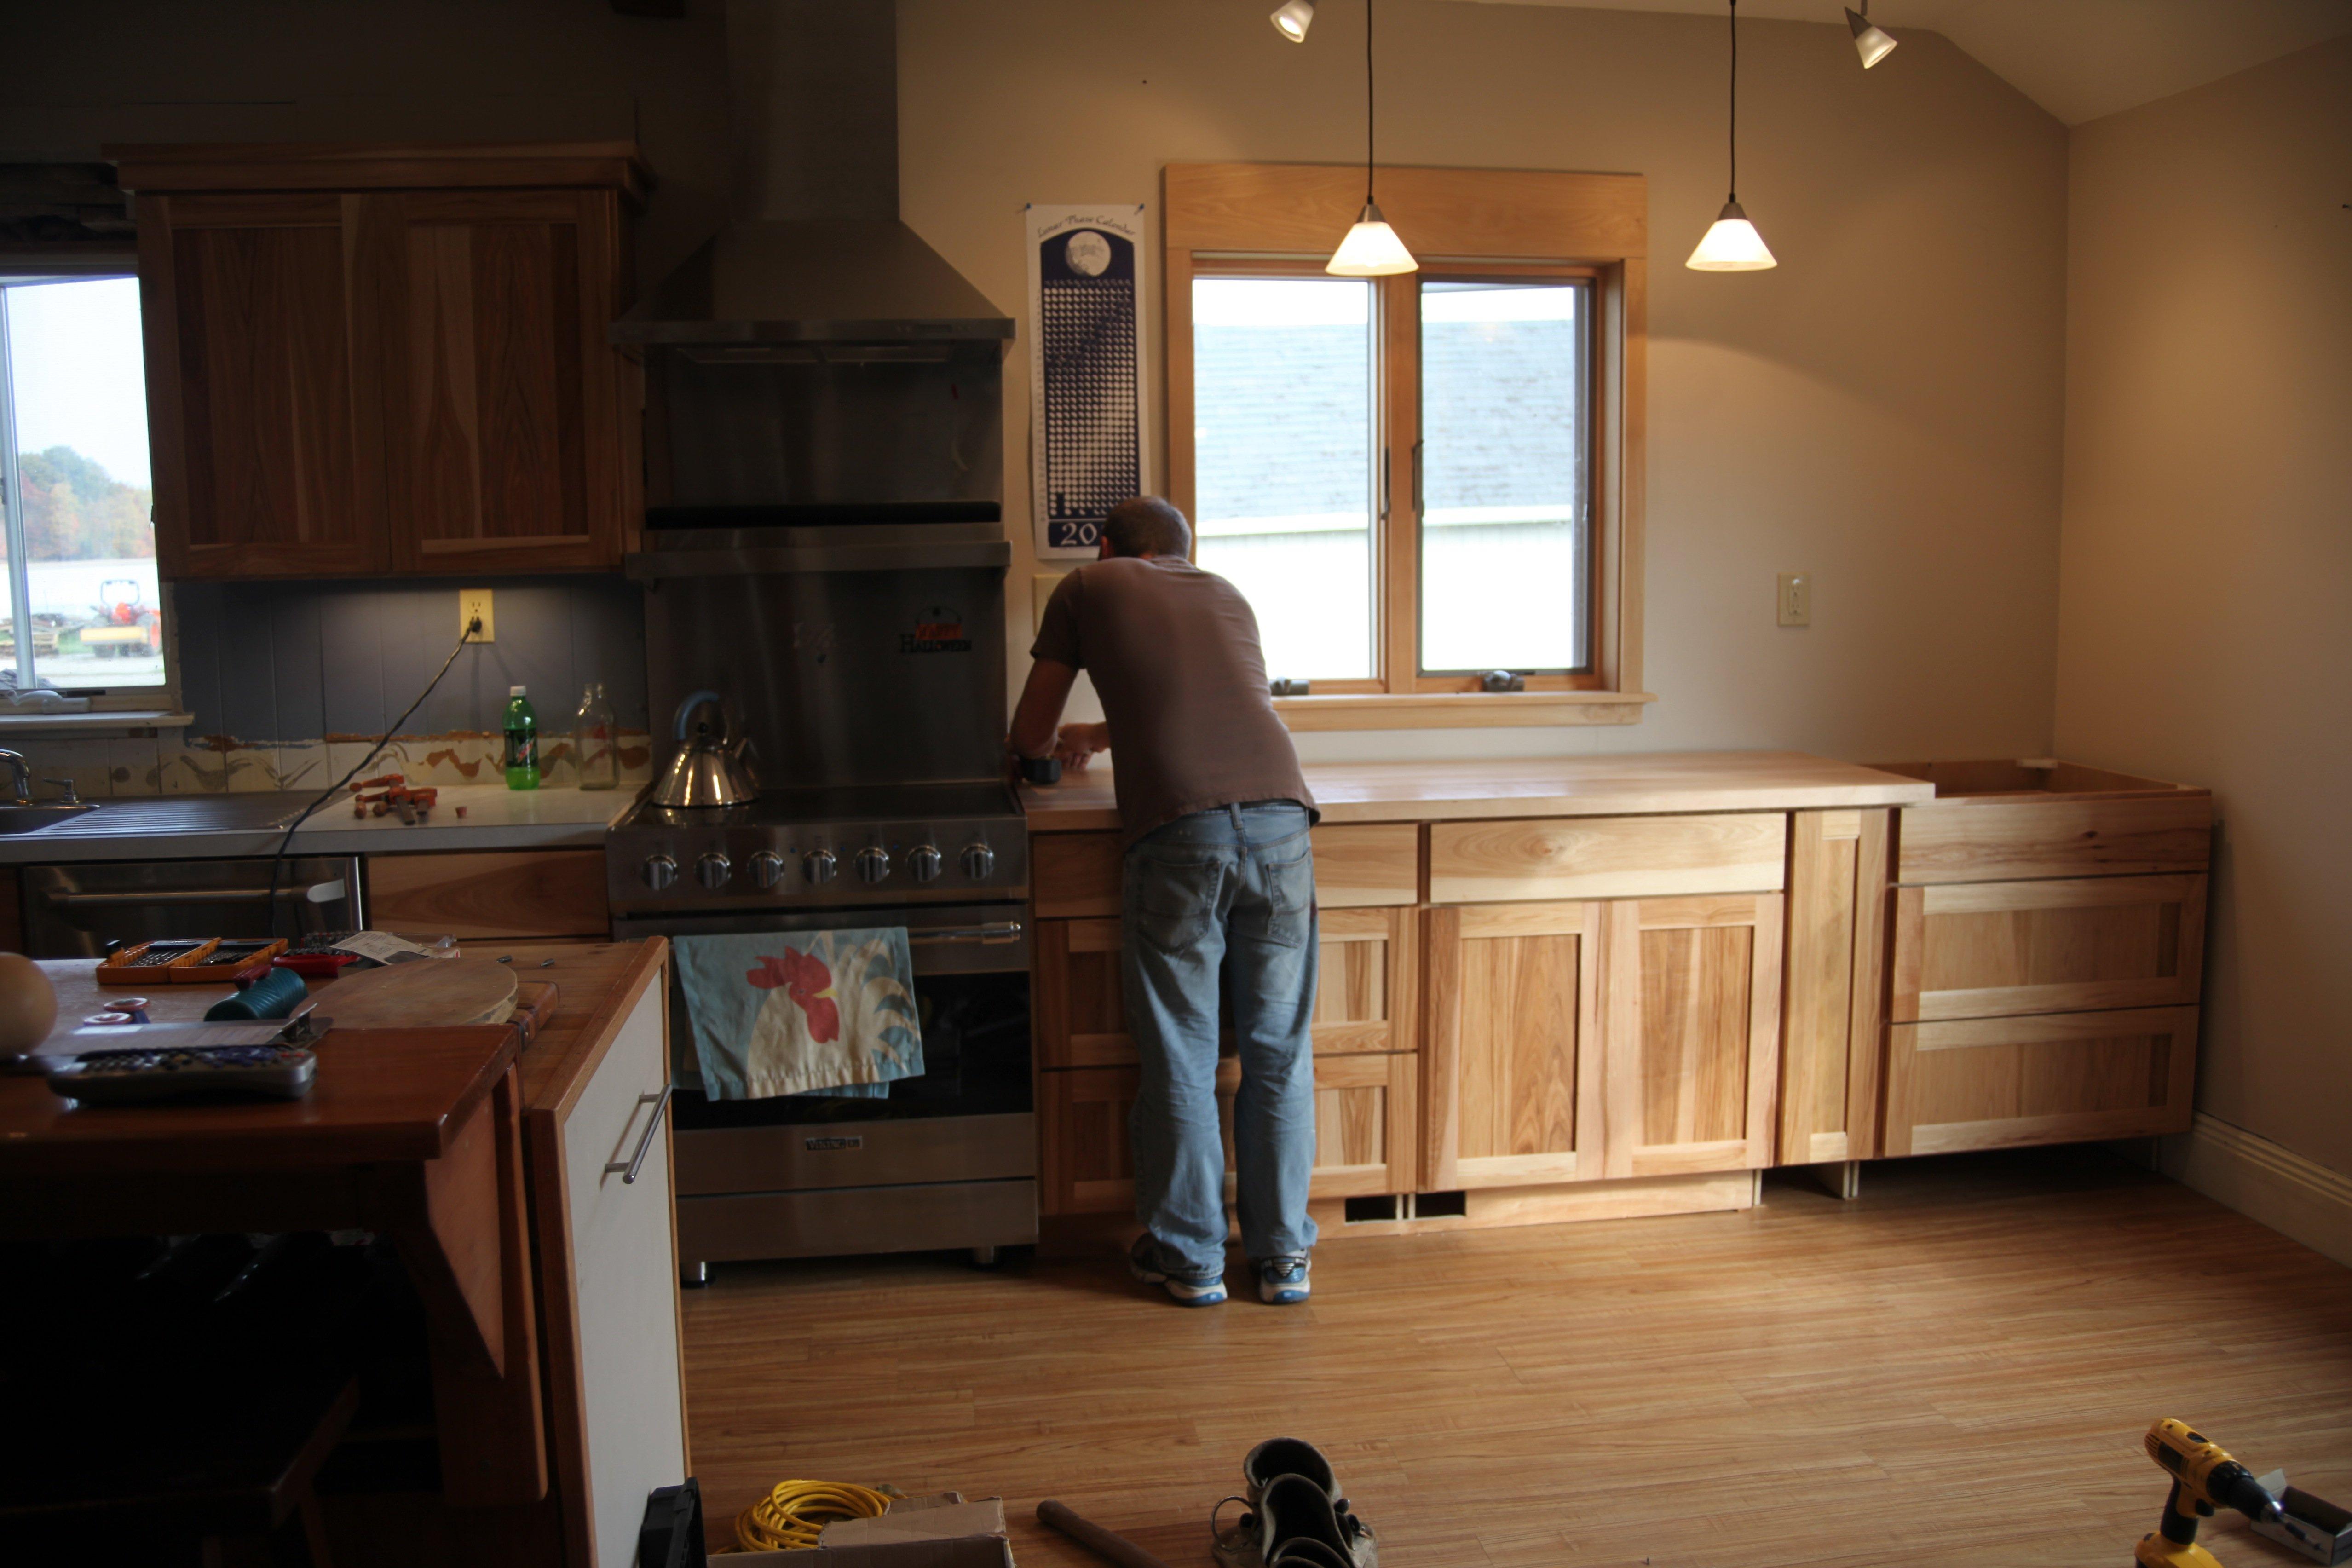 the work of kitchen #1